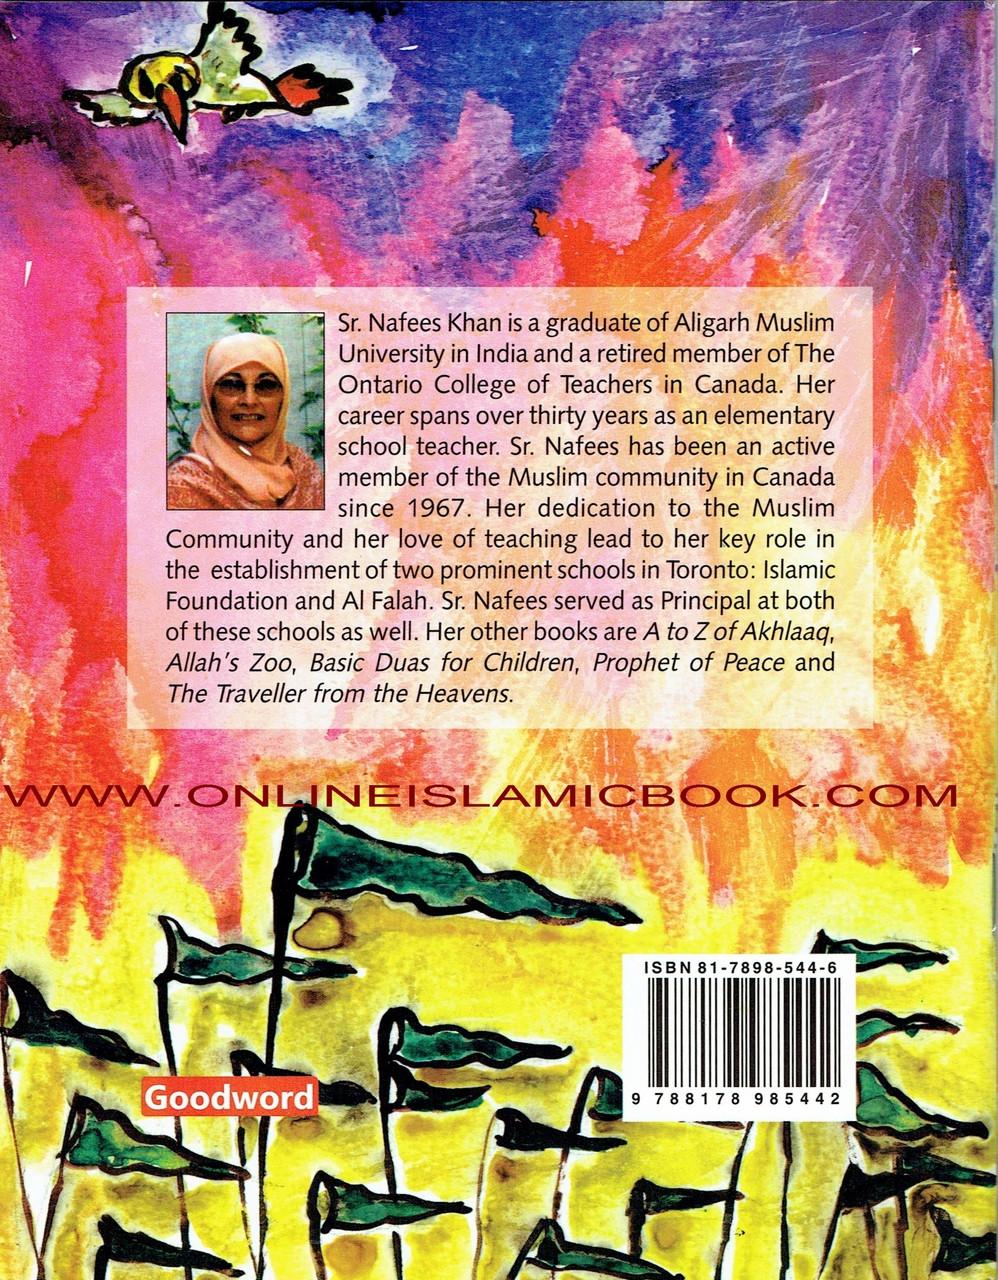 Abu Bakr Siddiq- The First Caliph Of Islam (Children Story Book)